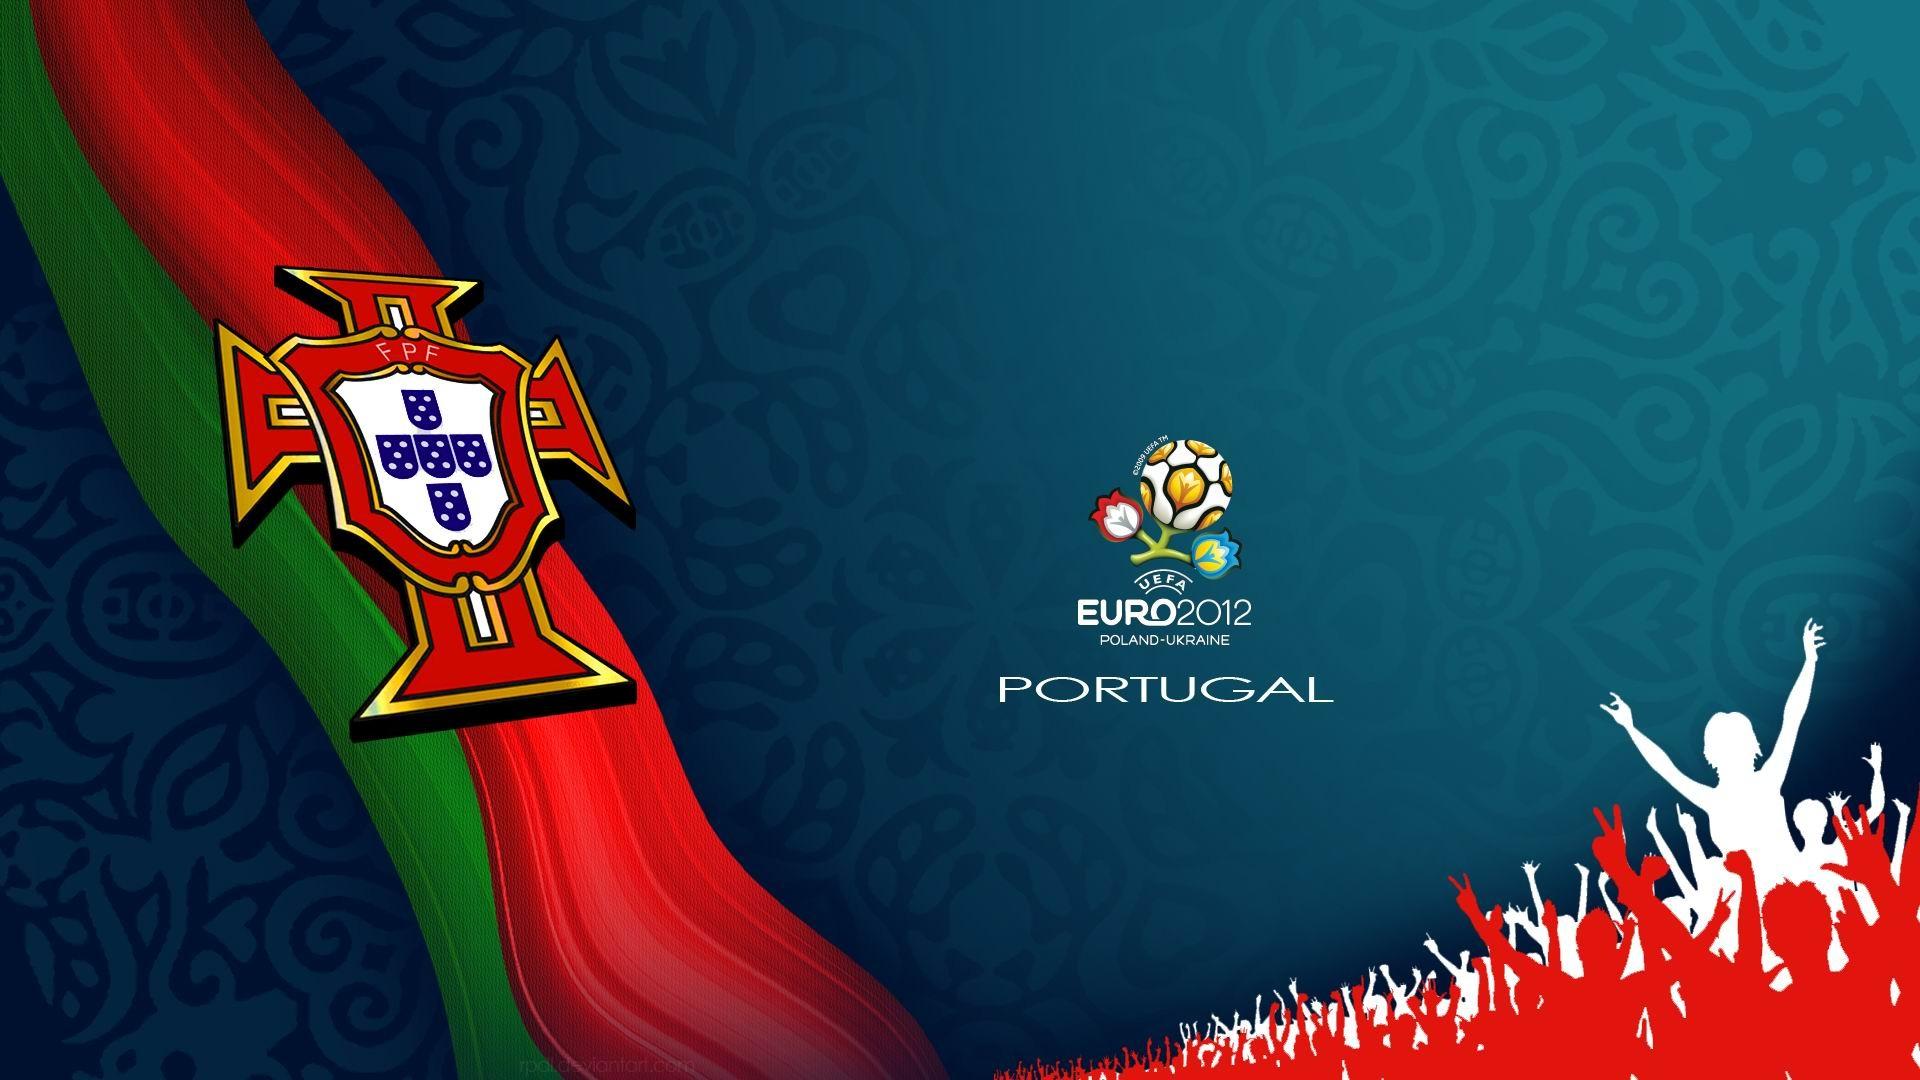 Portugal euro 2012 hd fond d 39 cran 1920x1080 for Fond ecran portugal